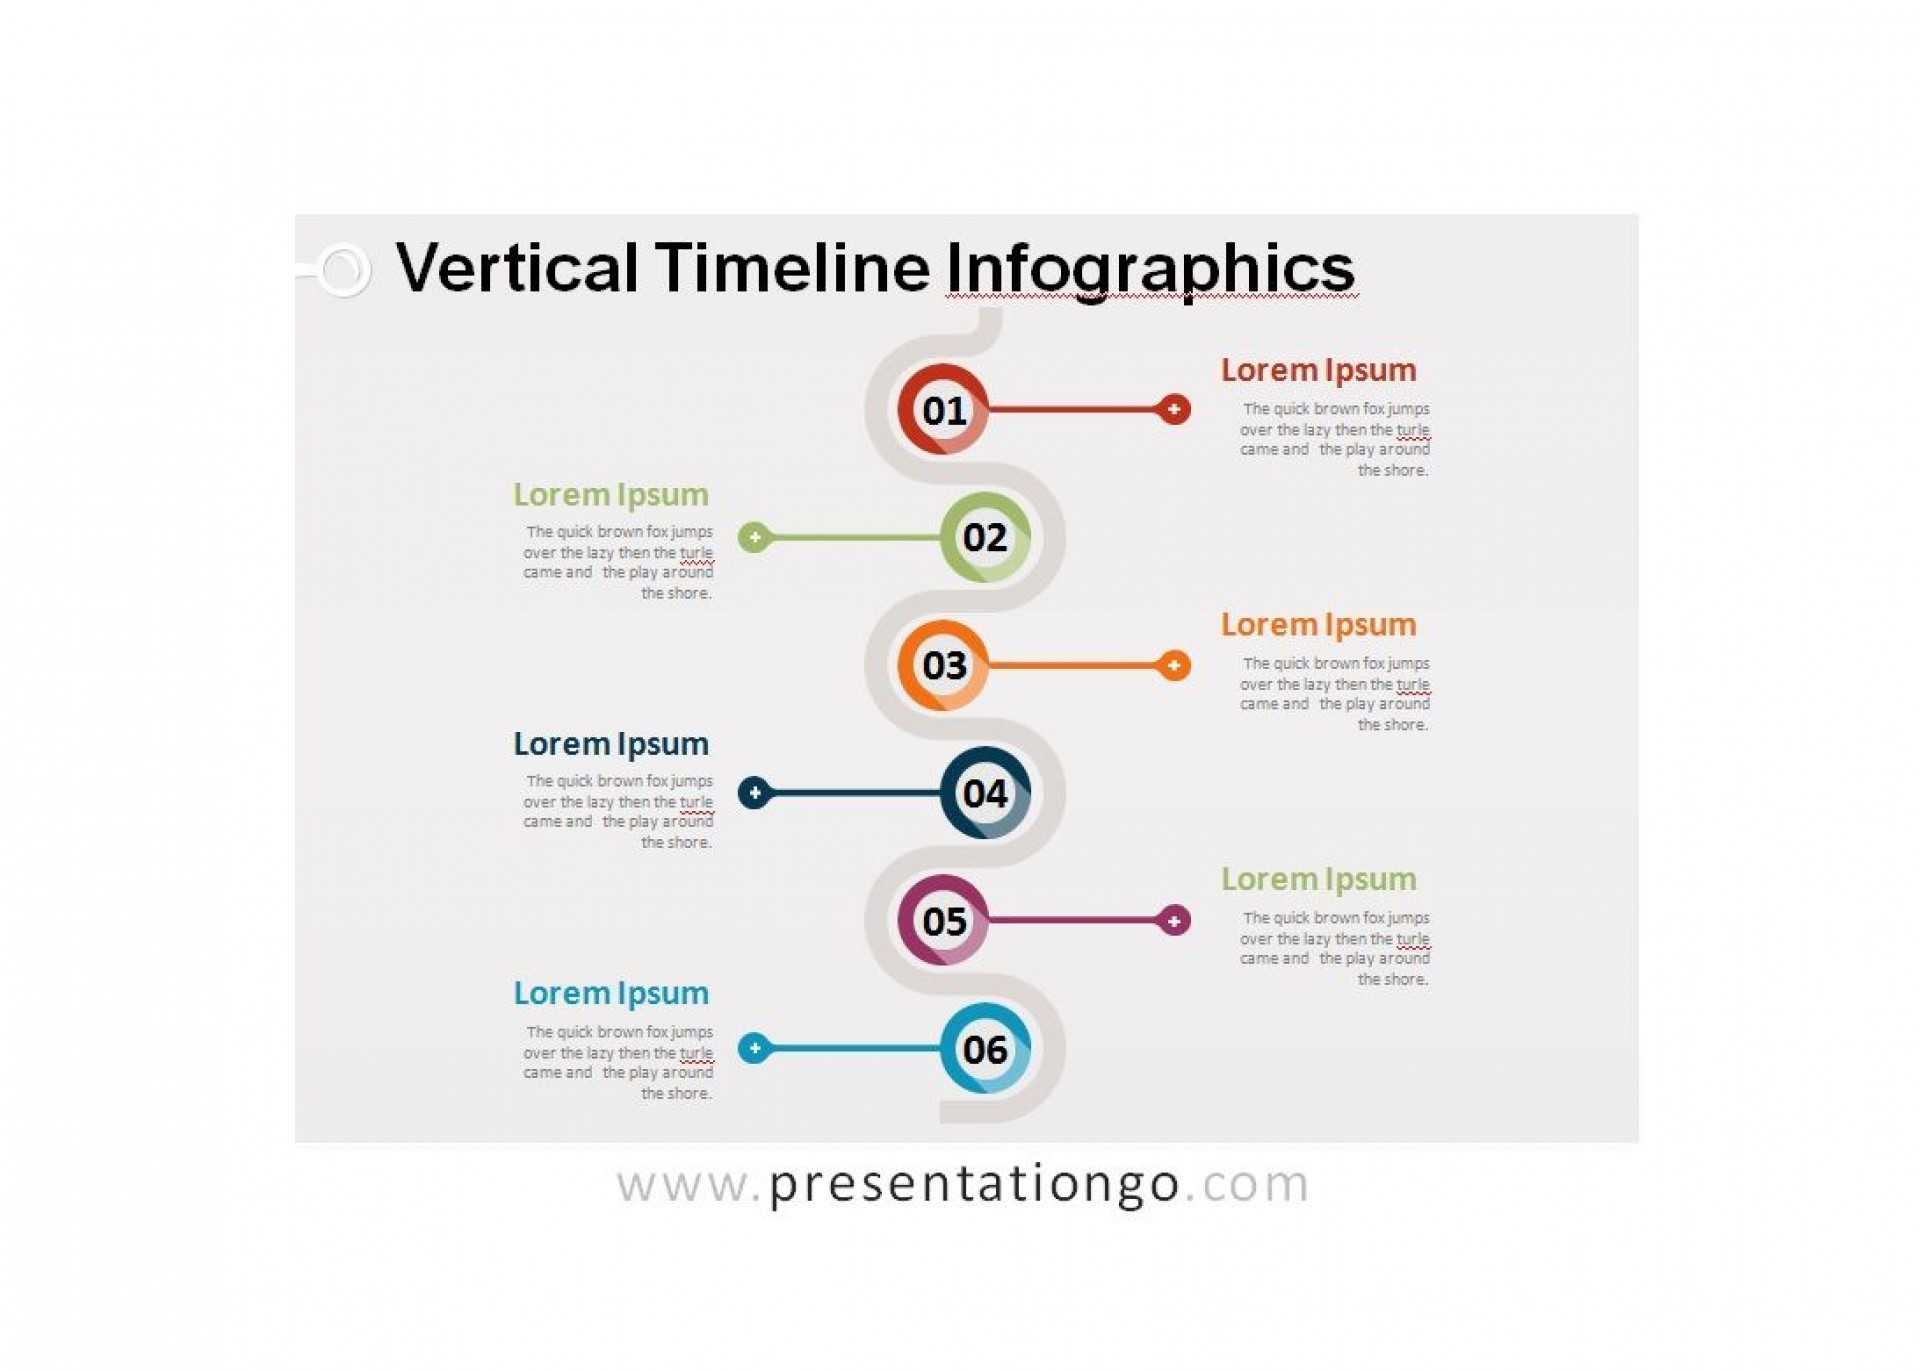 010 Impressive Timeline Template For Word Photo  Wordpres Free1920